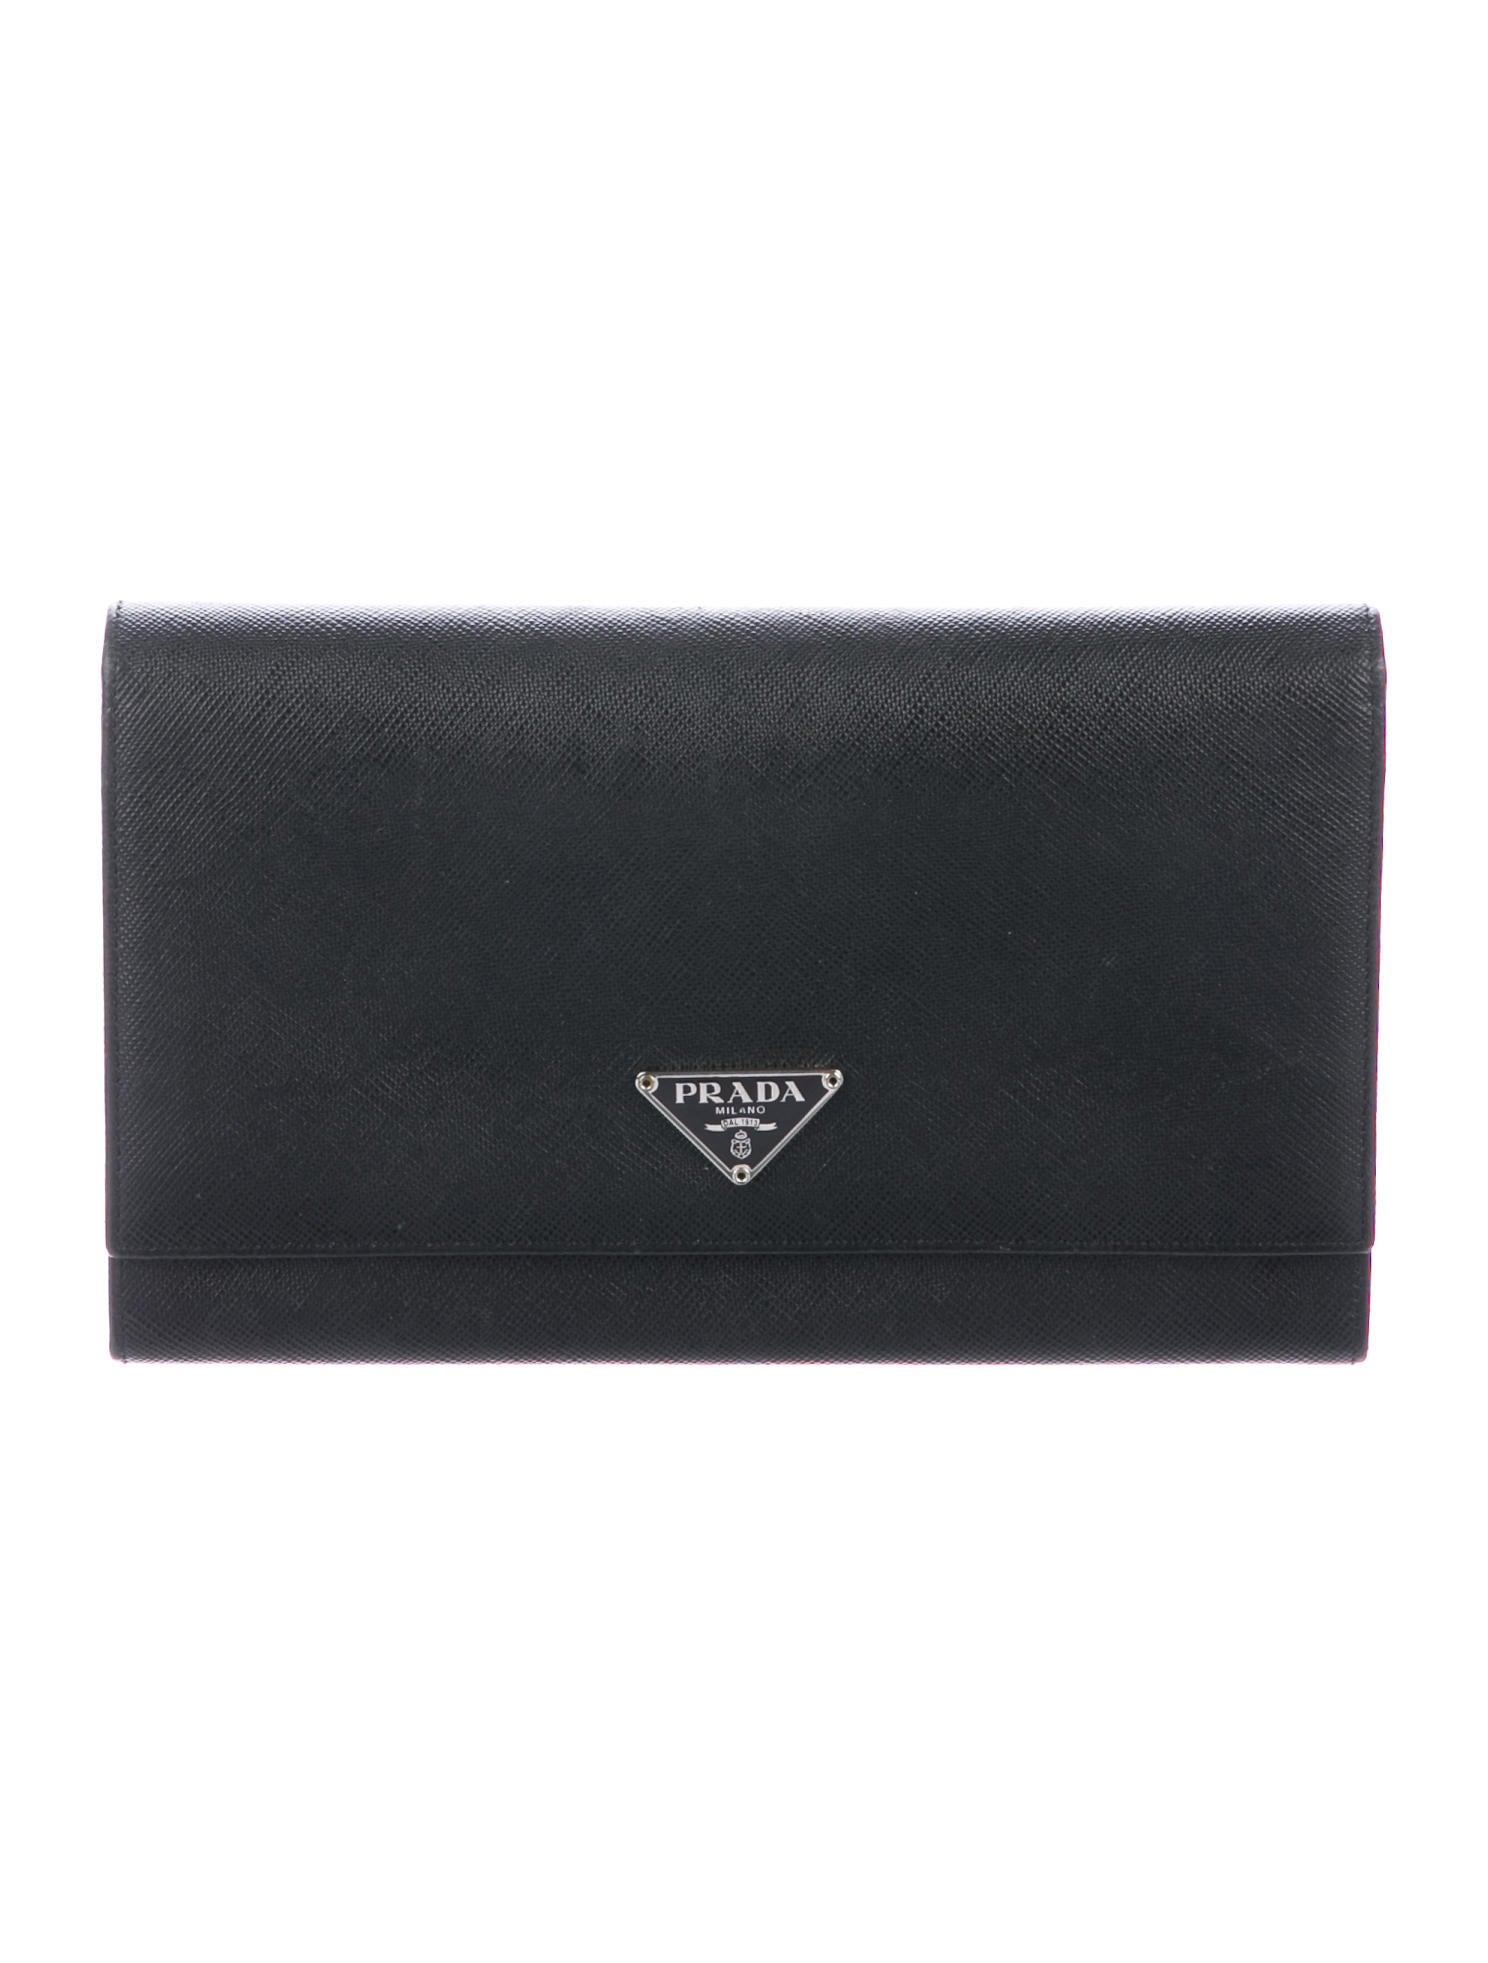 d2f538acf85156 Prada Saffiano Continental Wallet - Accessories - PRA276173 | The ...